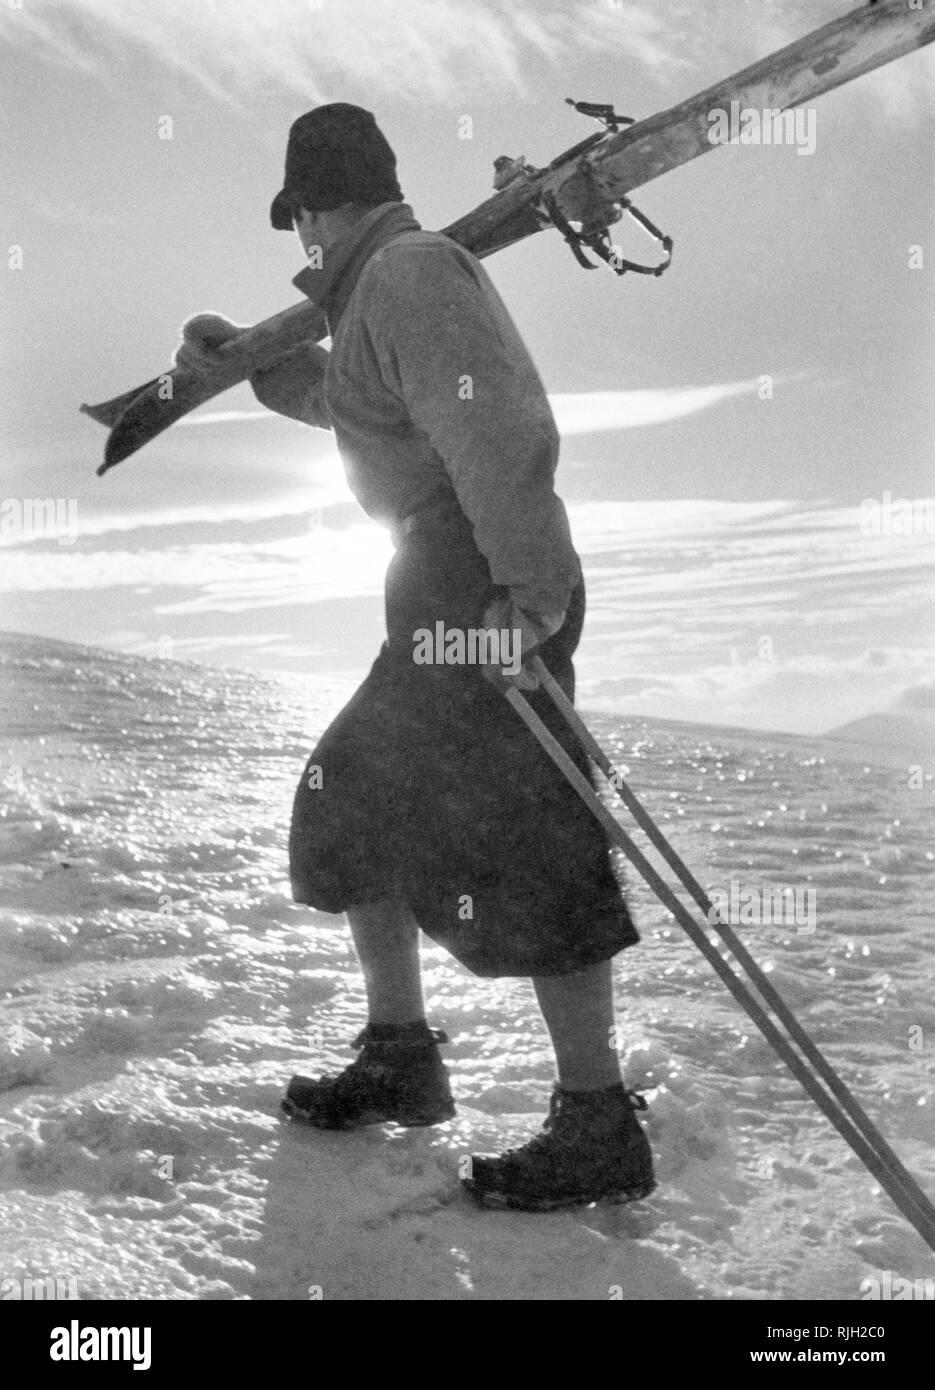 ski, gran sasso, 1950 - Stock Image